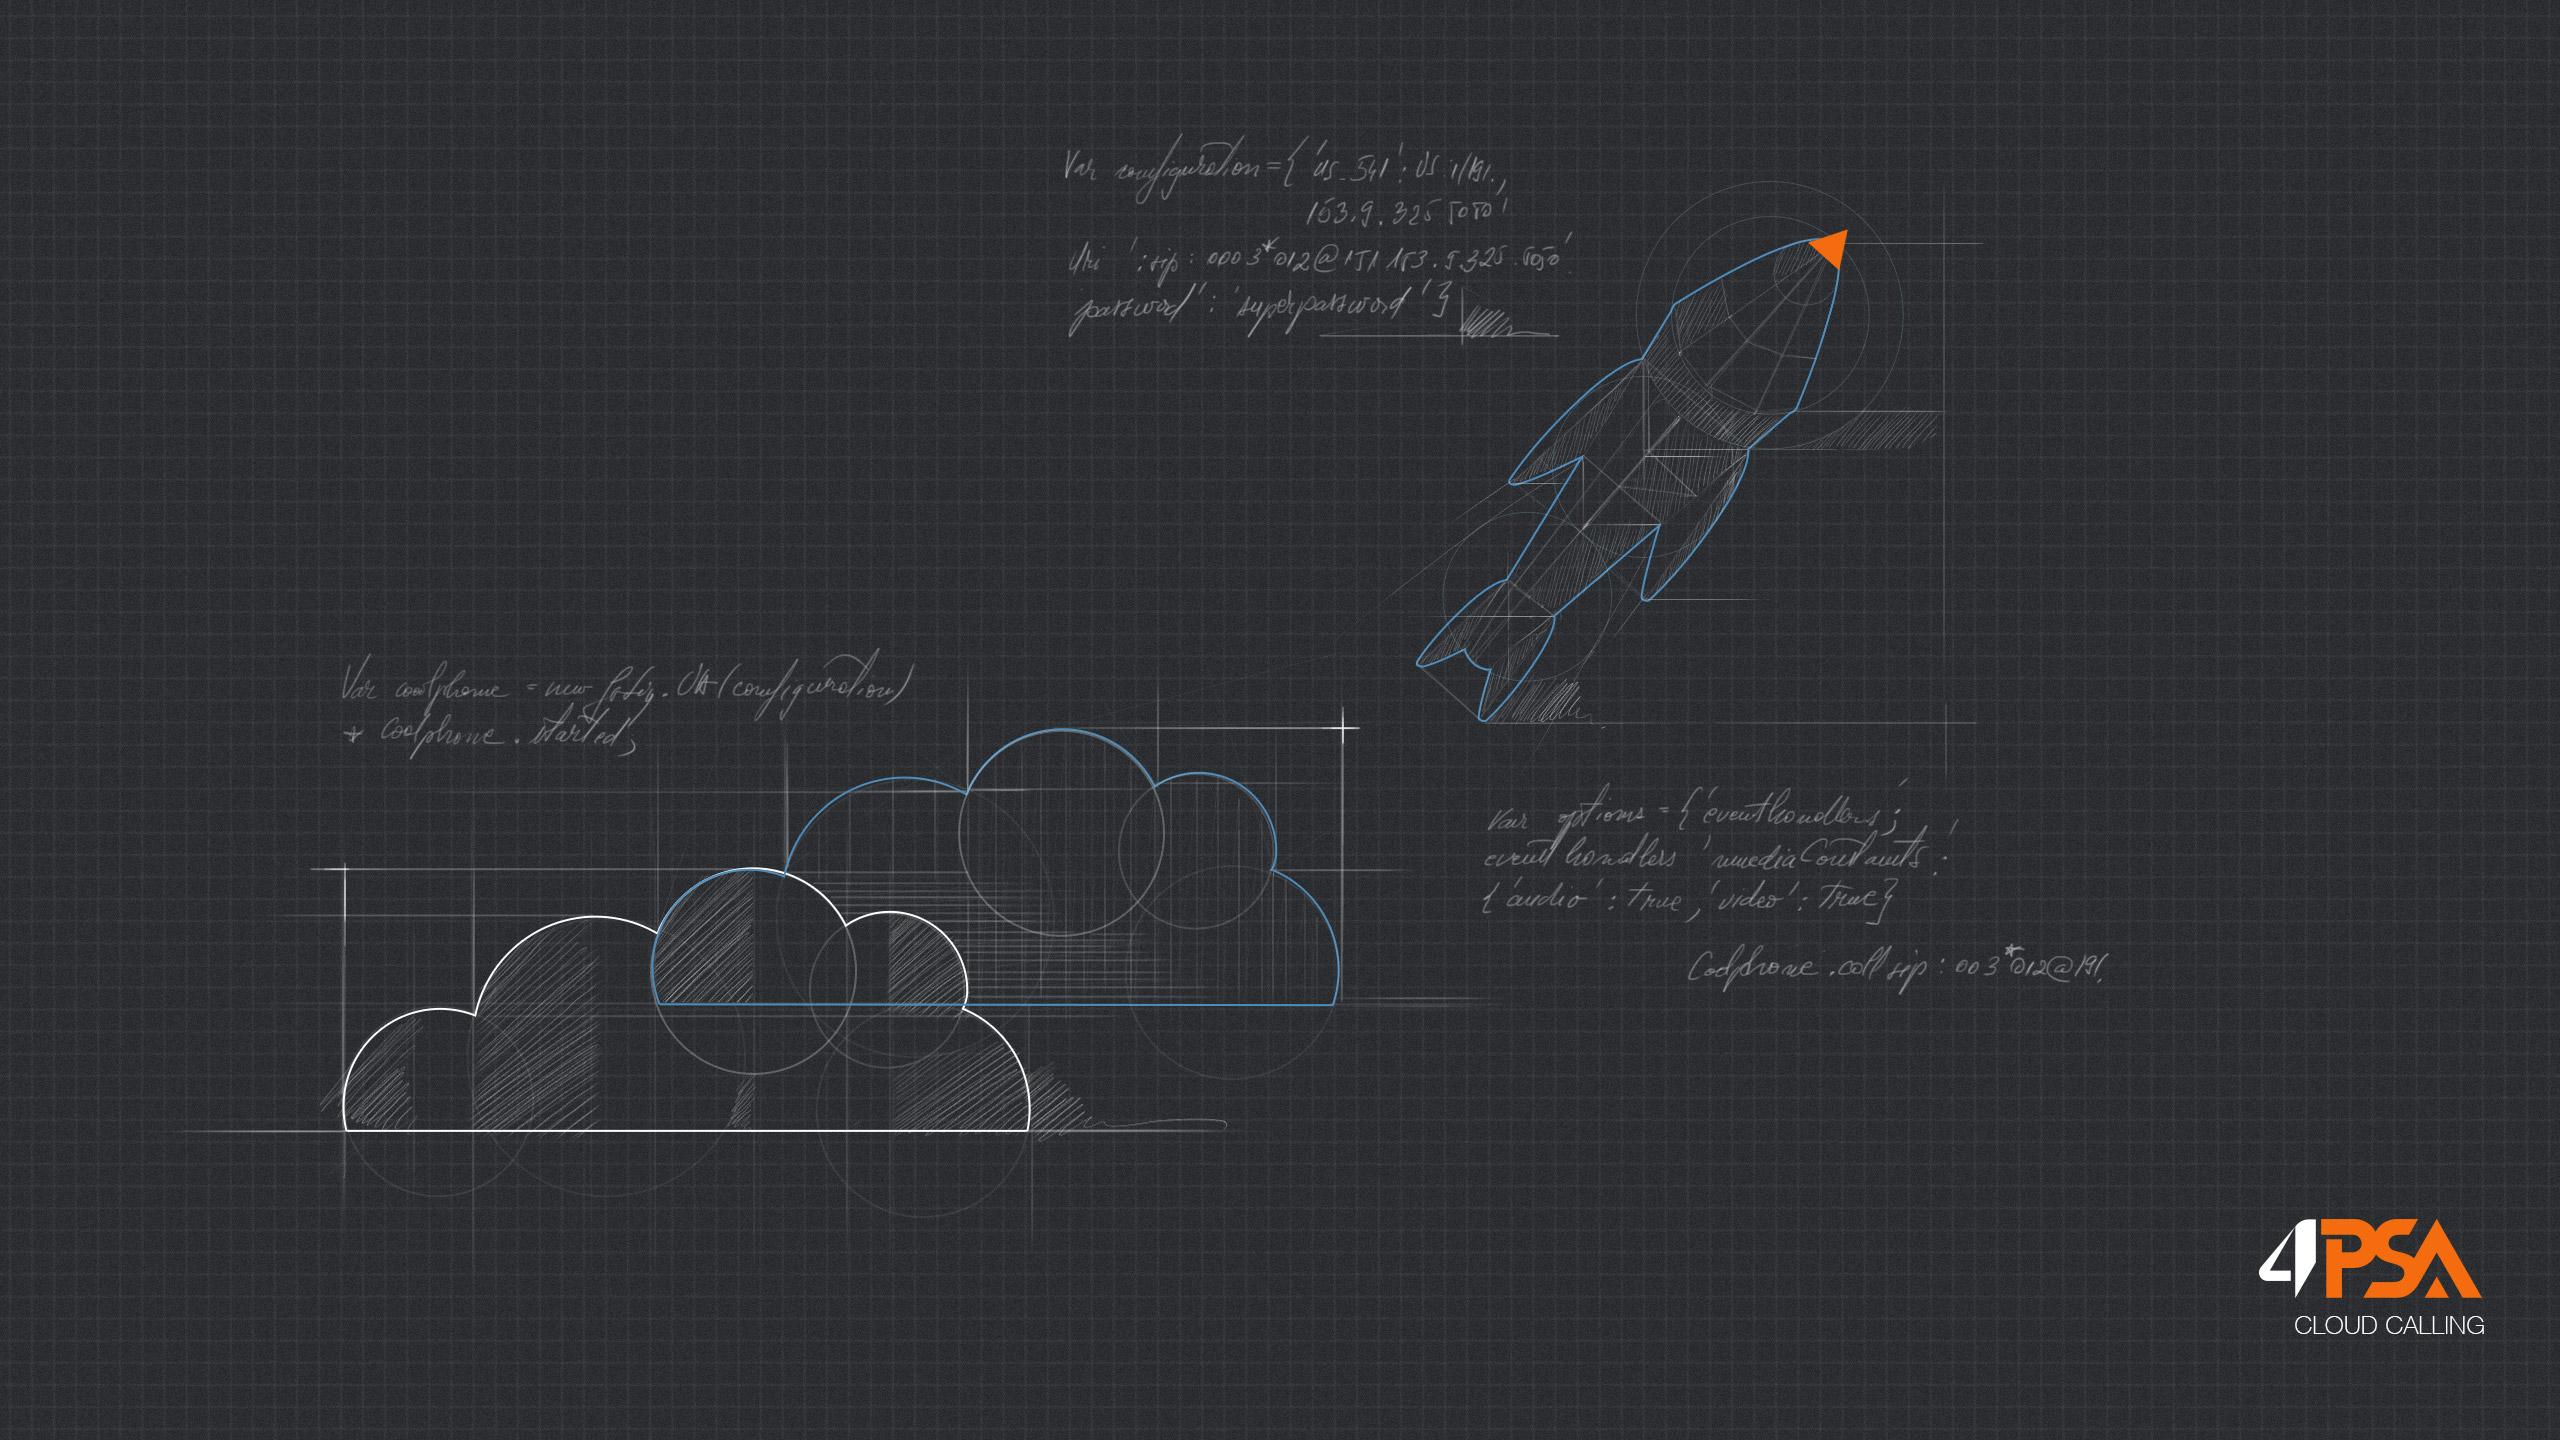 4PSA - Cloud Calling Wallpaper Drone Schematic Diagram on